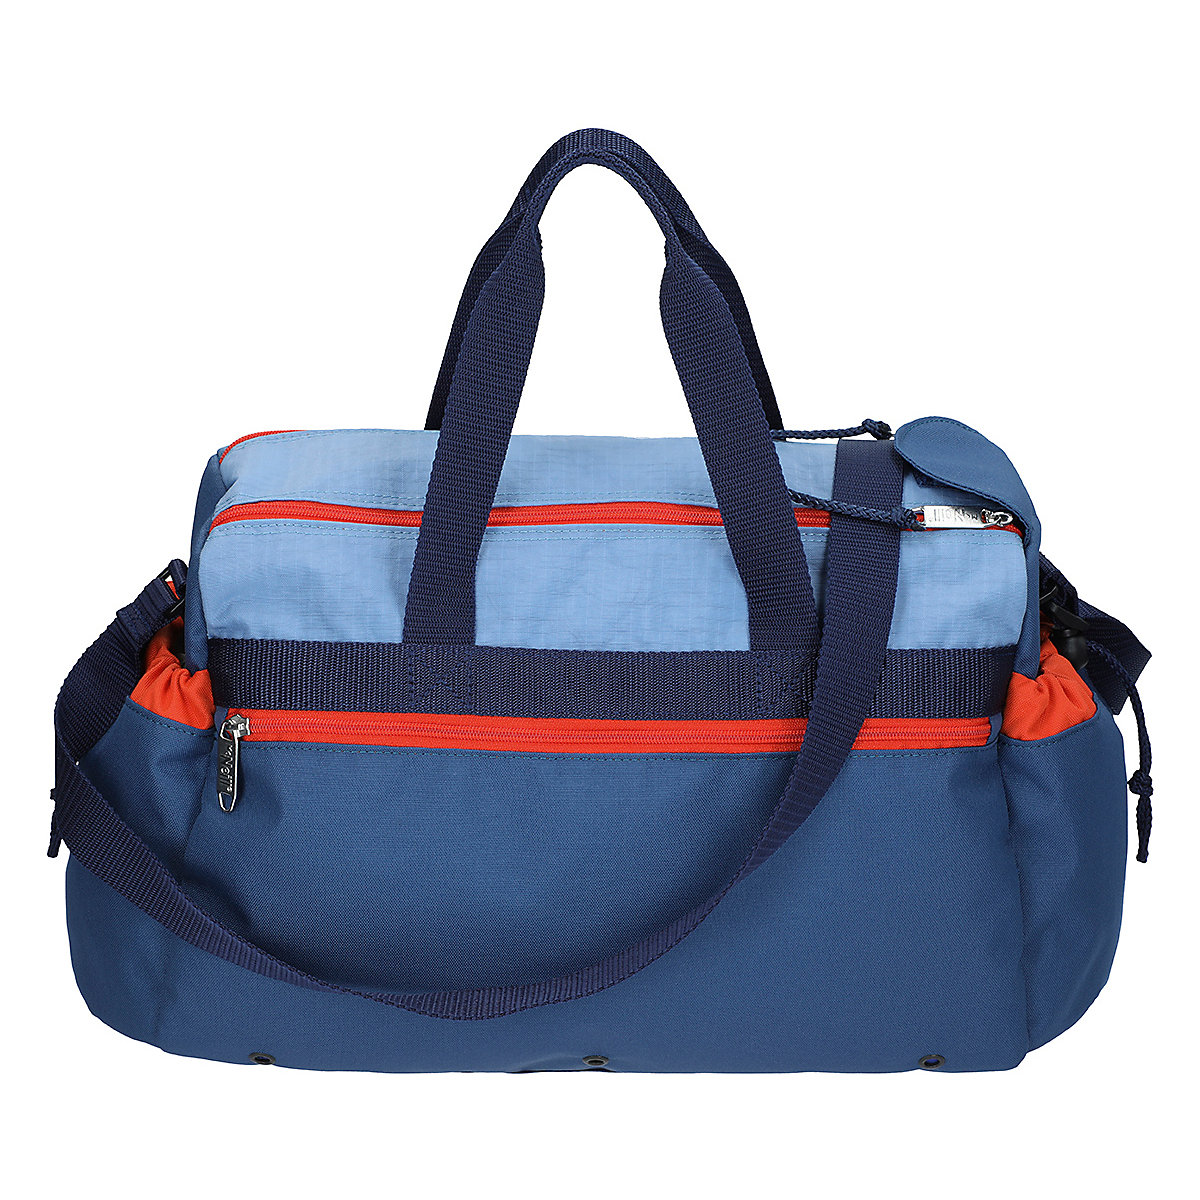 McNeill, Sporttasche Ranger, blau